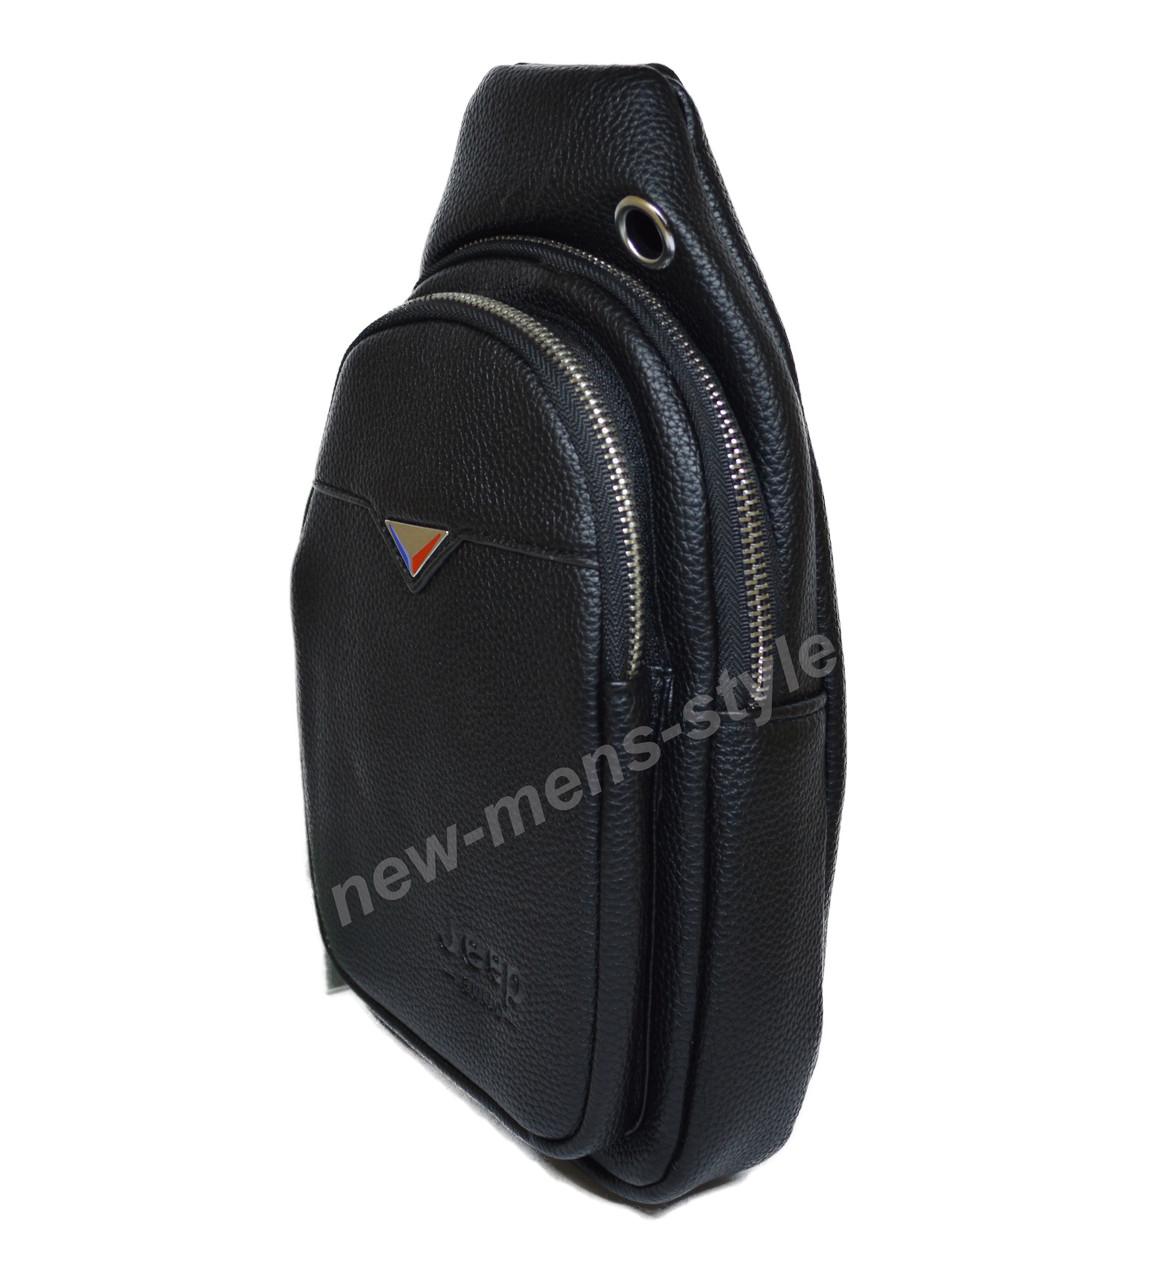 0f5314d1e000 Мужская спортивная кожаная сумка слинг рюкзак бананка Jeep BULUO, ...